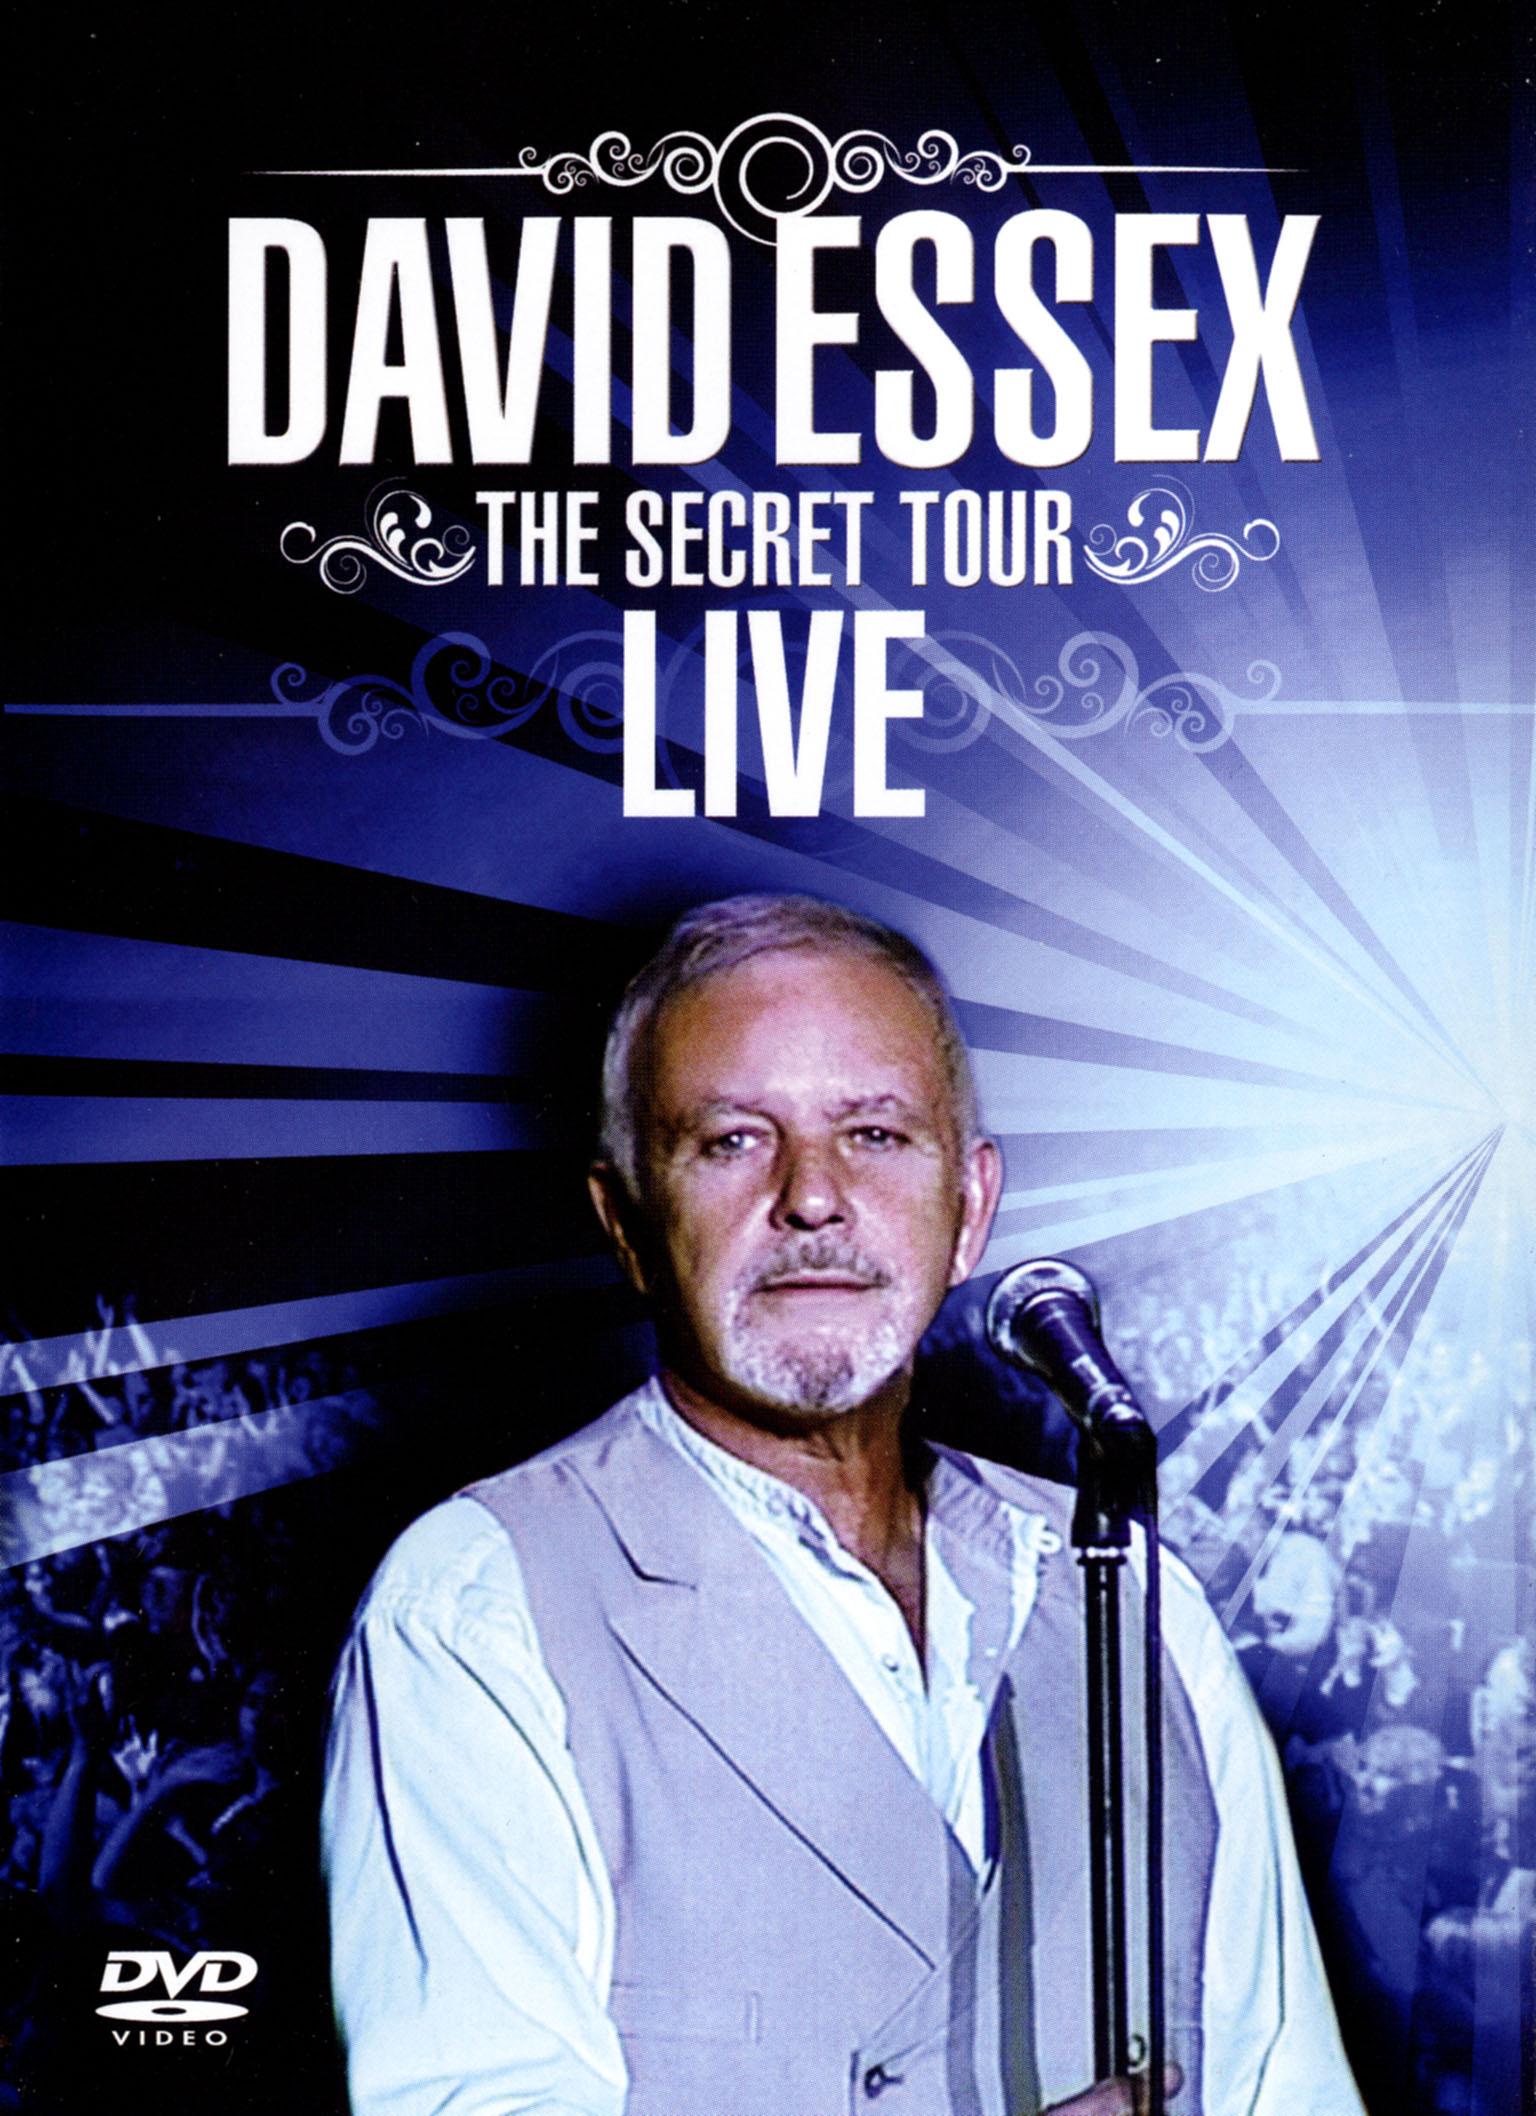 David Essex: The Secret Tour - Live